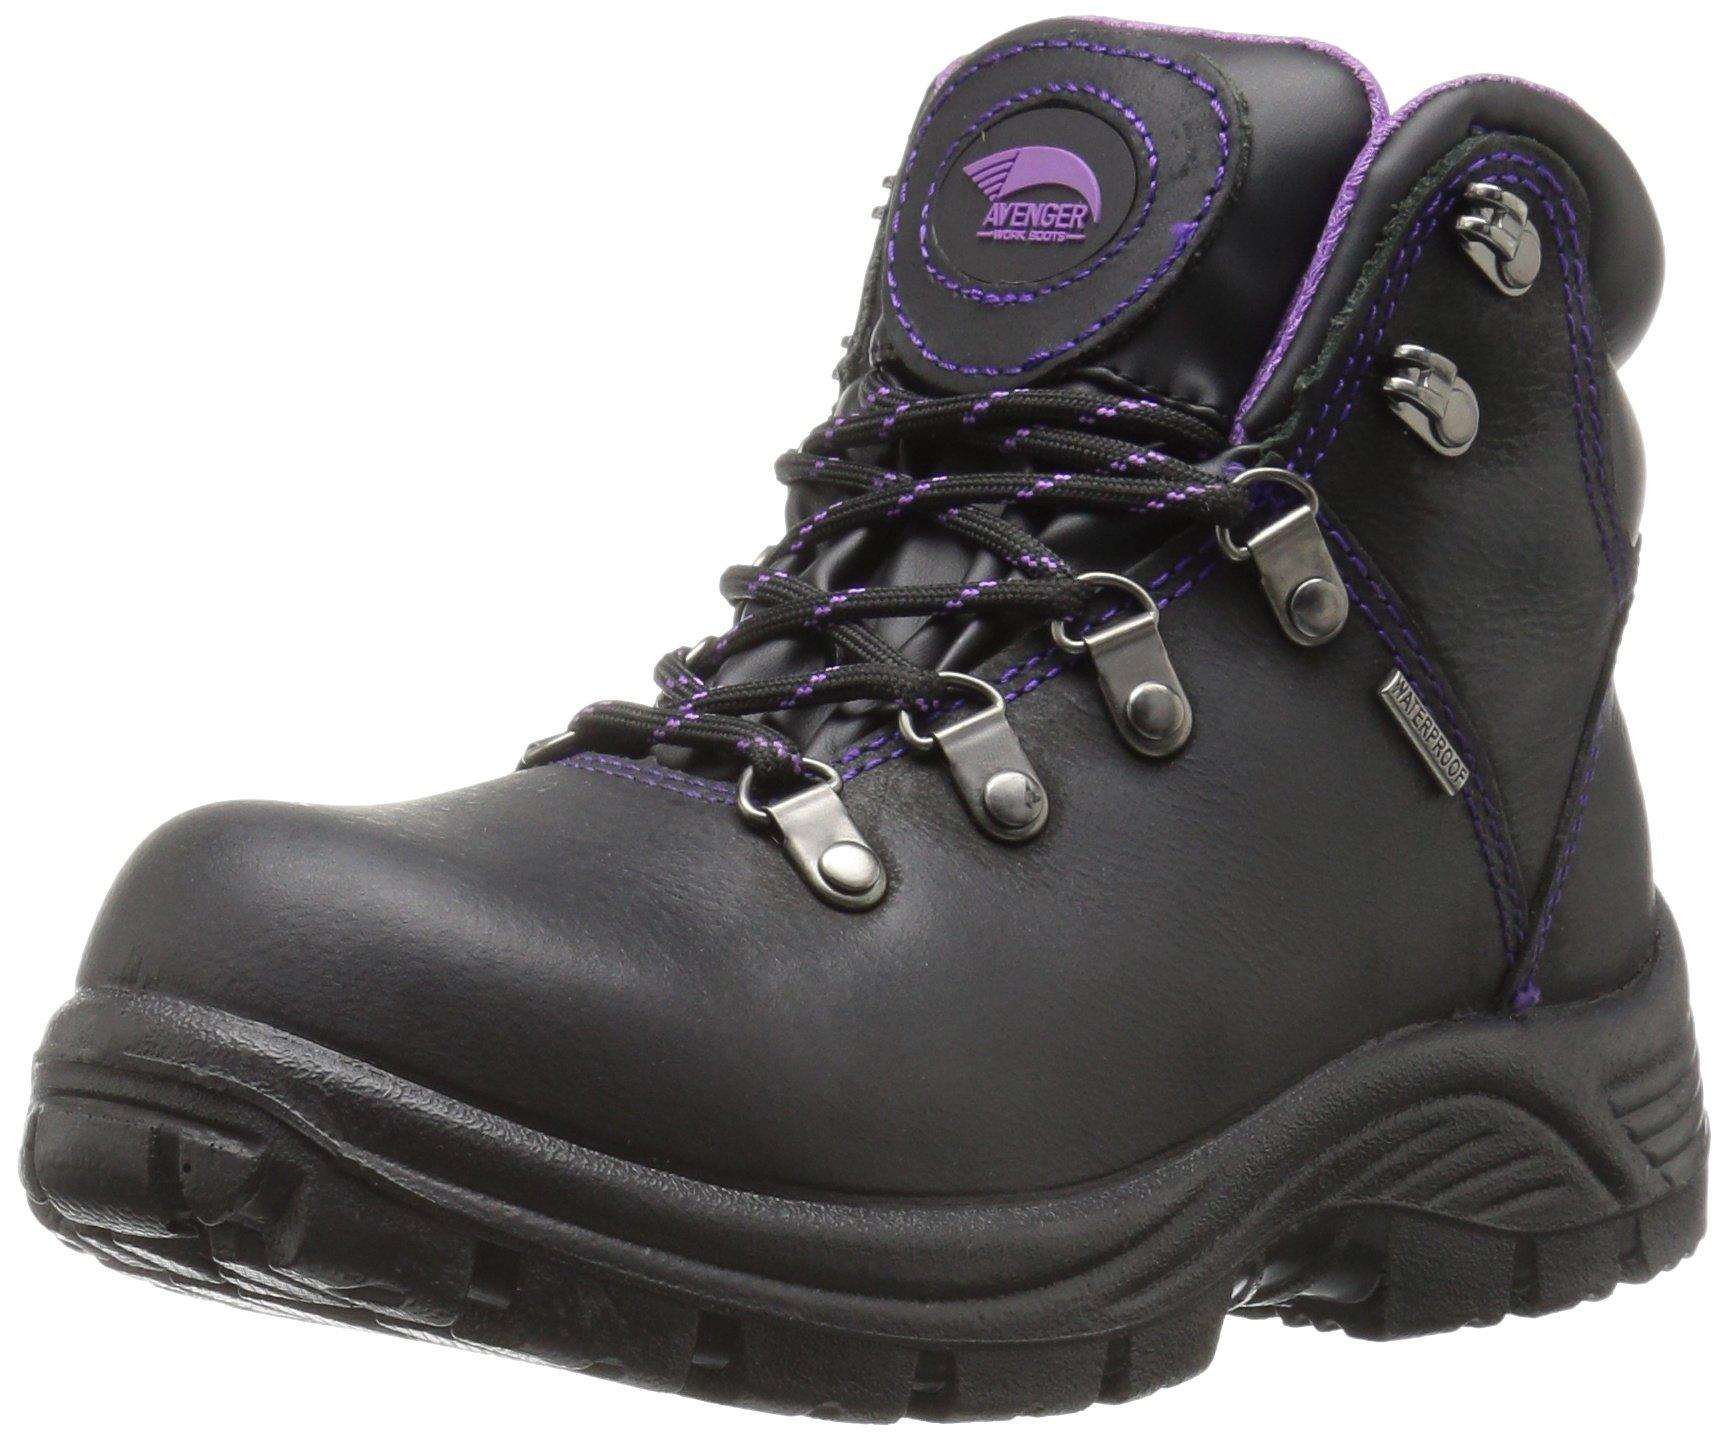 Avenger Safety Footwear Women's Avenger 7124 Waterproof Safety Toe EH SR Hiker Industrial Construction Shoe, Black, 11 M US